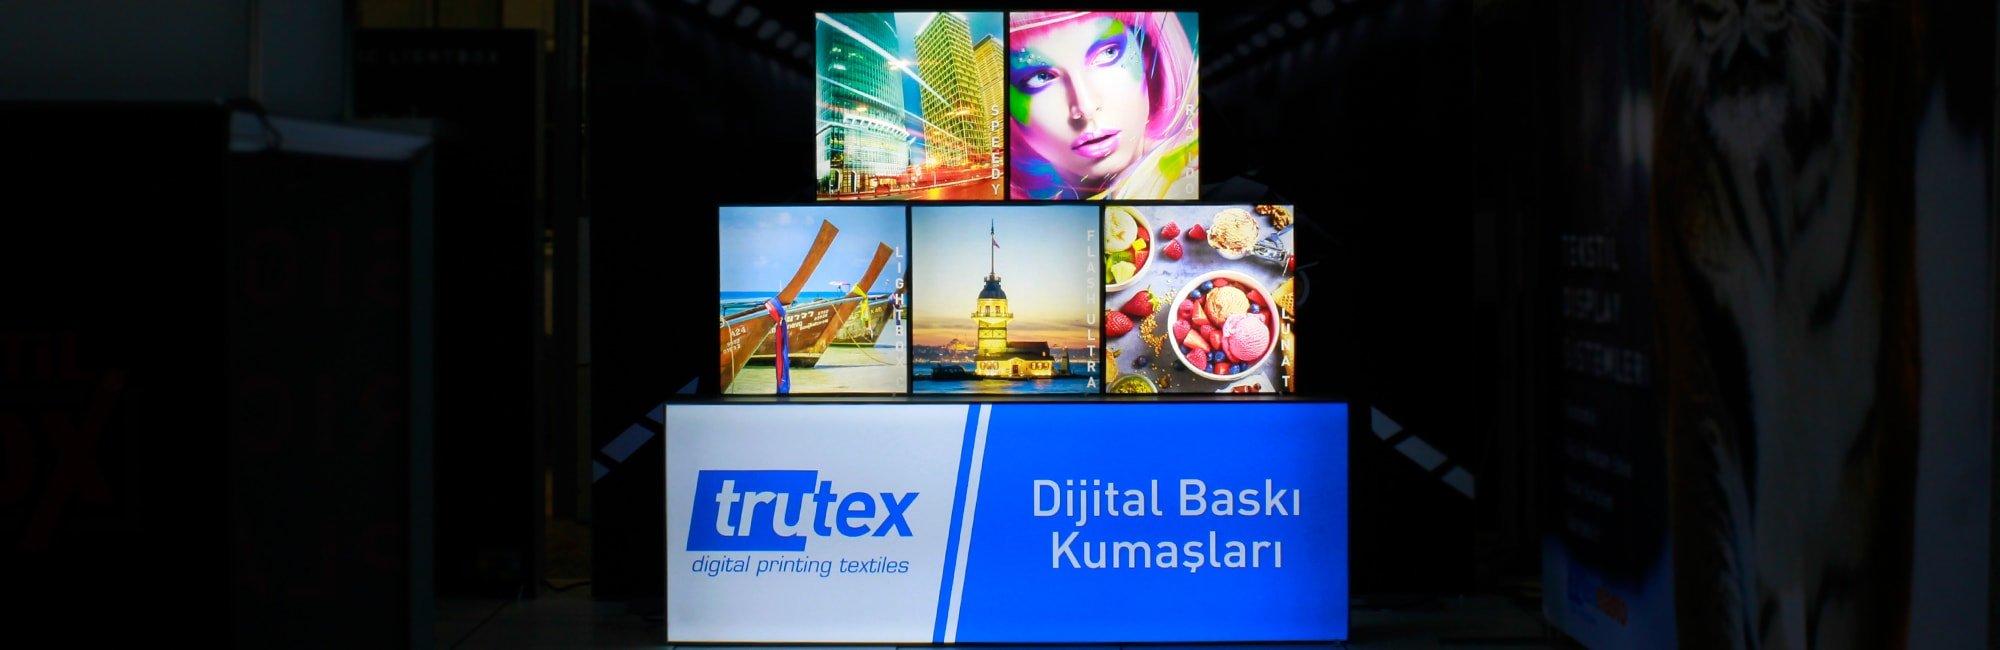 dijital-baski-kumasi